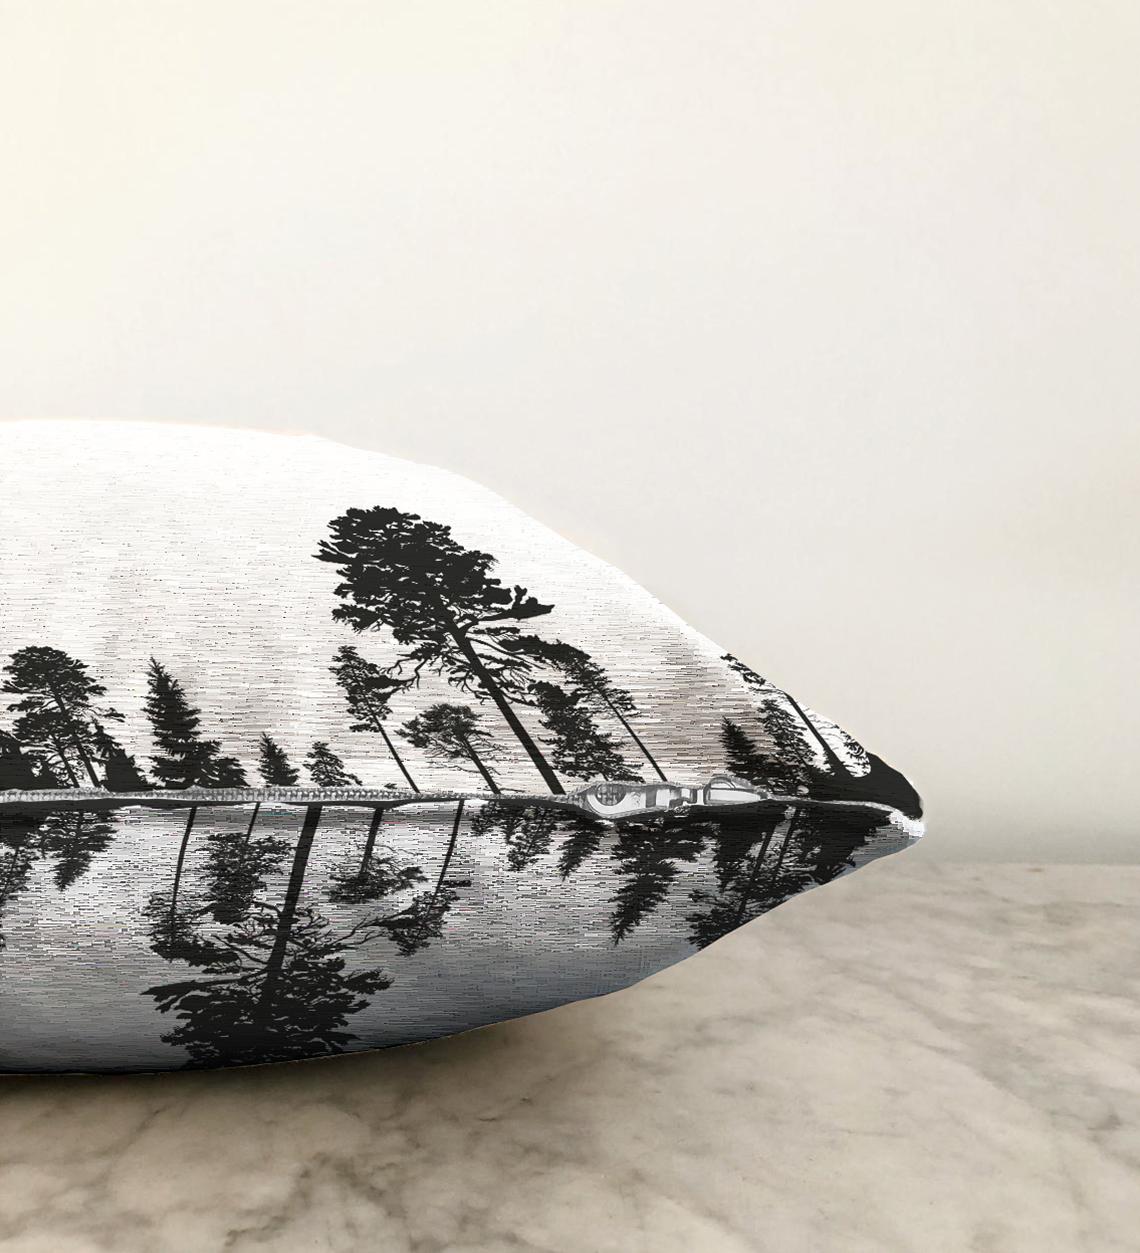 Realhomes Ağaç Tasarımlı Çift Taraflı Dekoratif Şönil Yastık Kılıfı - 55 x 55 cm Realhomes